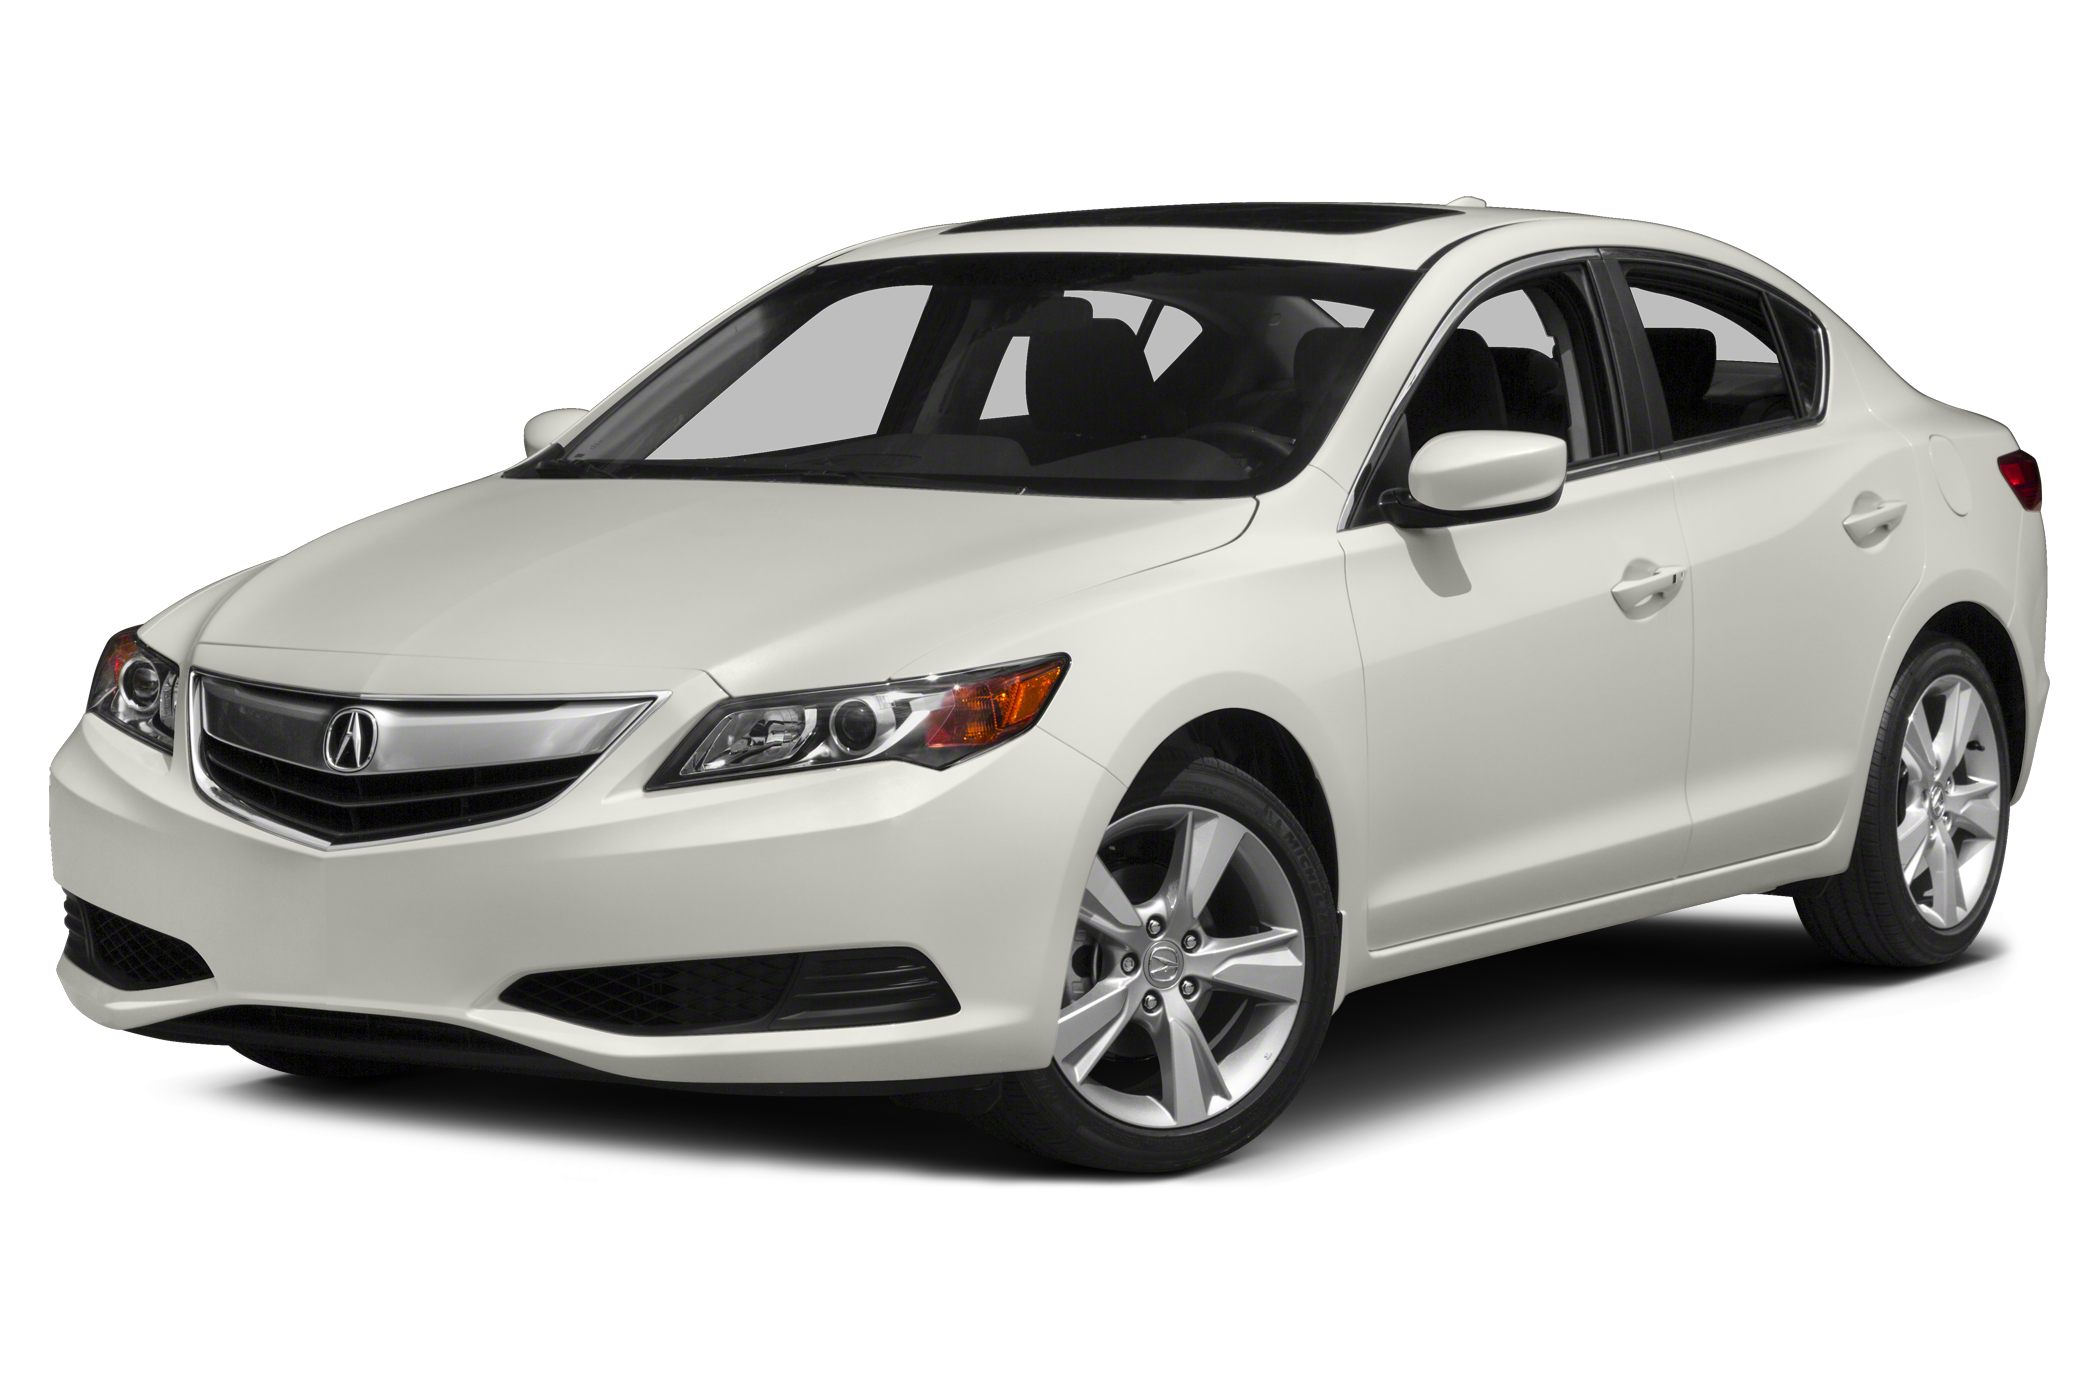 2015 Acura ILX New Car Test Drive